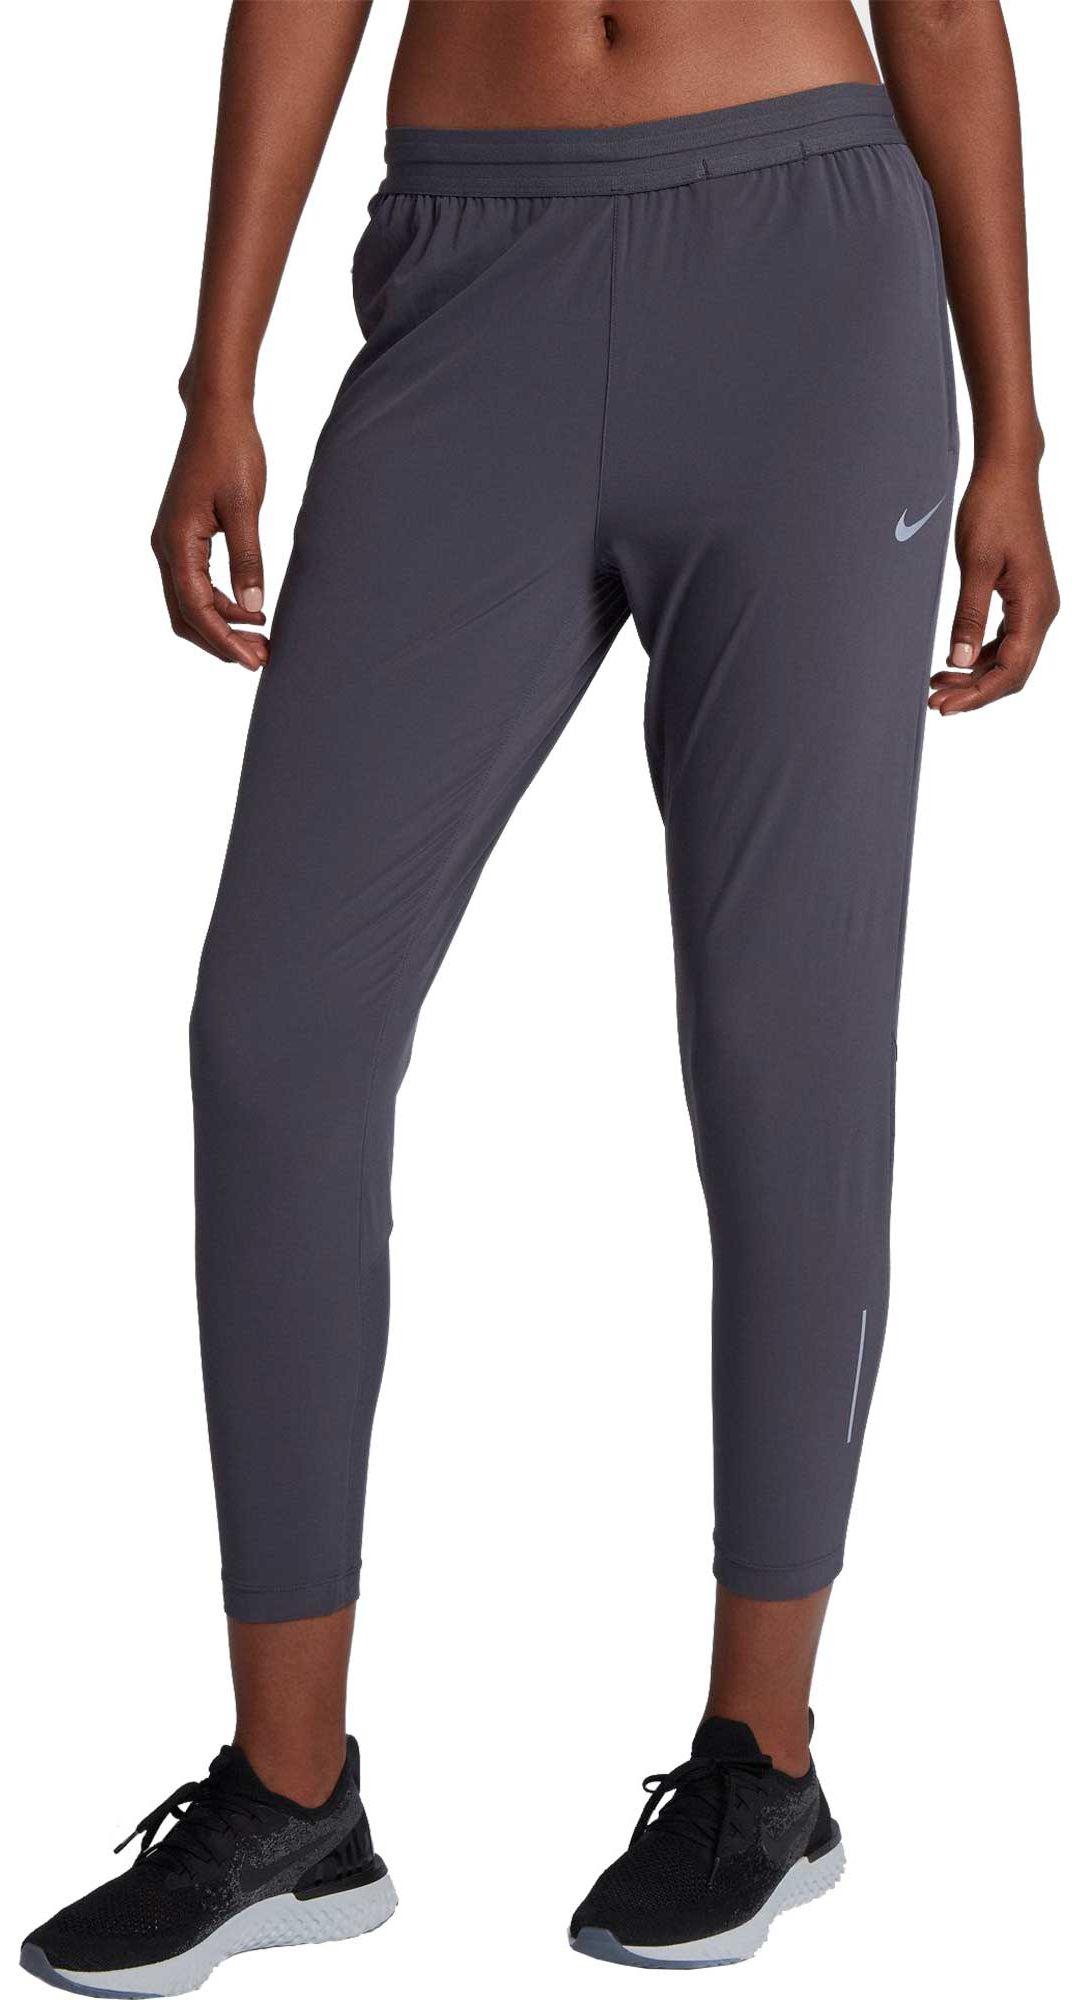 6ba76e9c Nike Women's Essential 7/8 Running Pants | DICK'S Sporting Goods